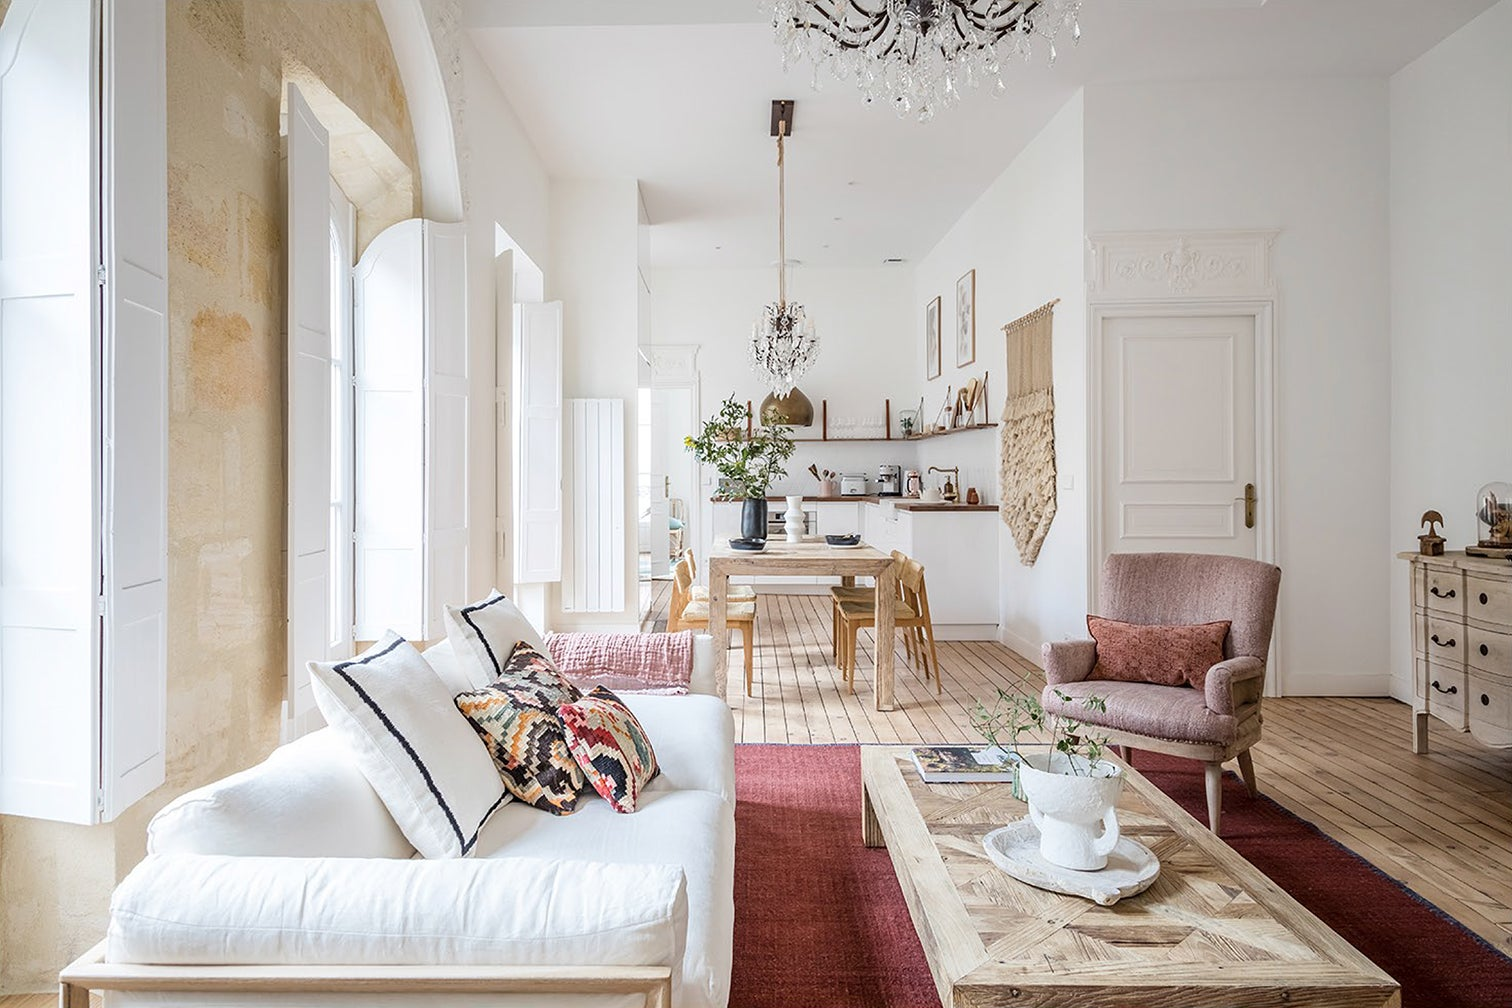 A Modern Partition Let (Even More) Light Into This 18-Century Bordeaux Apartment